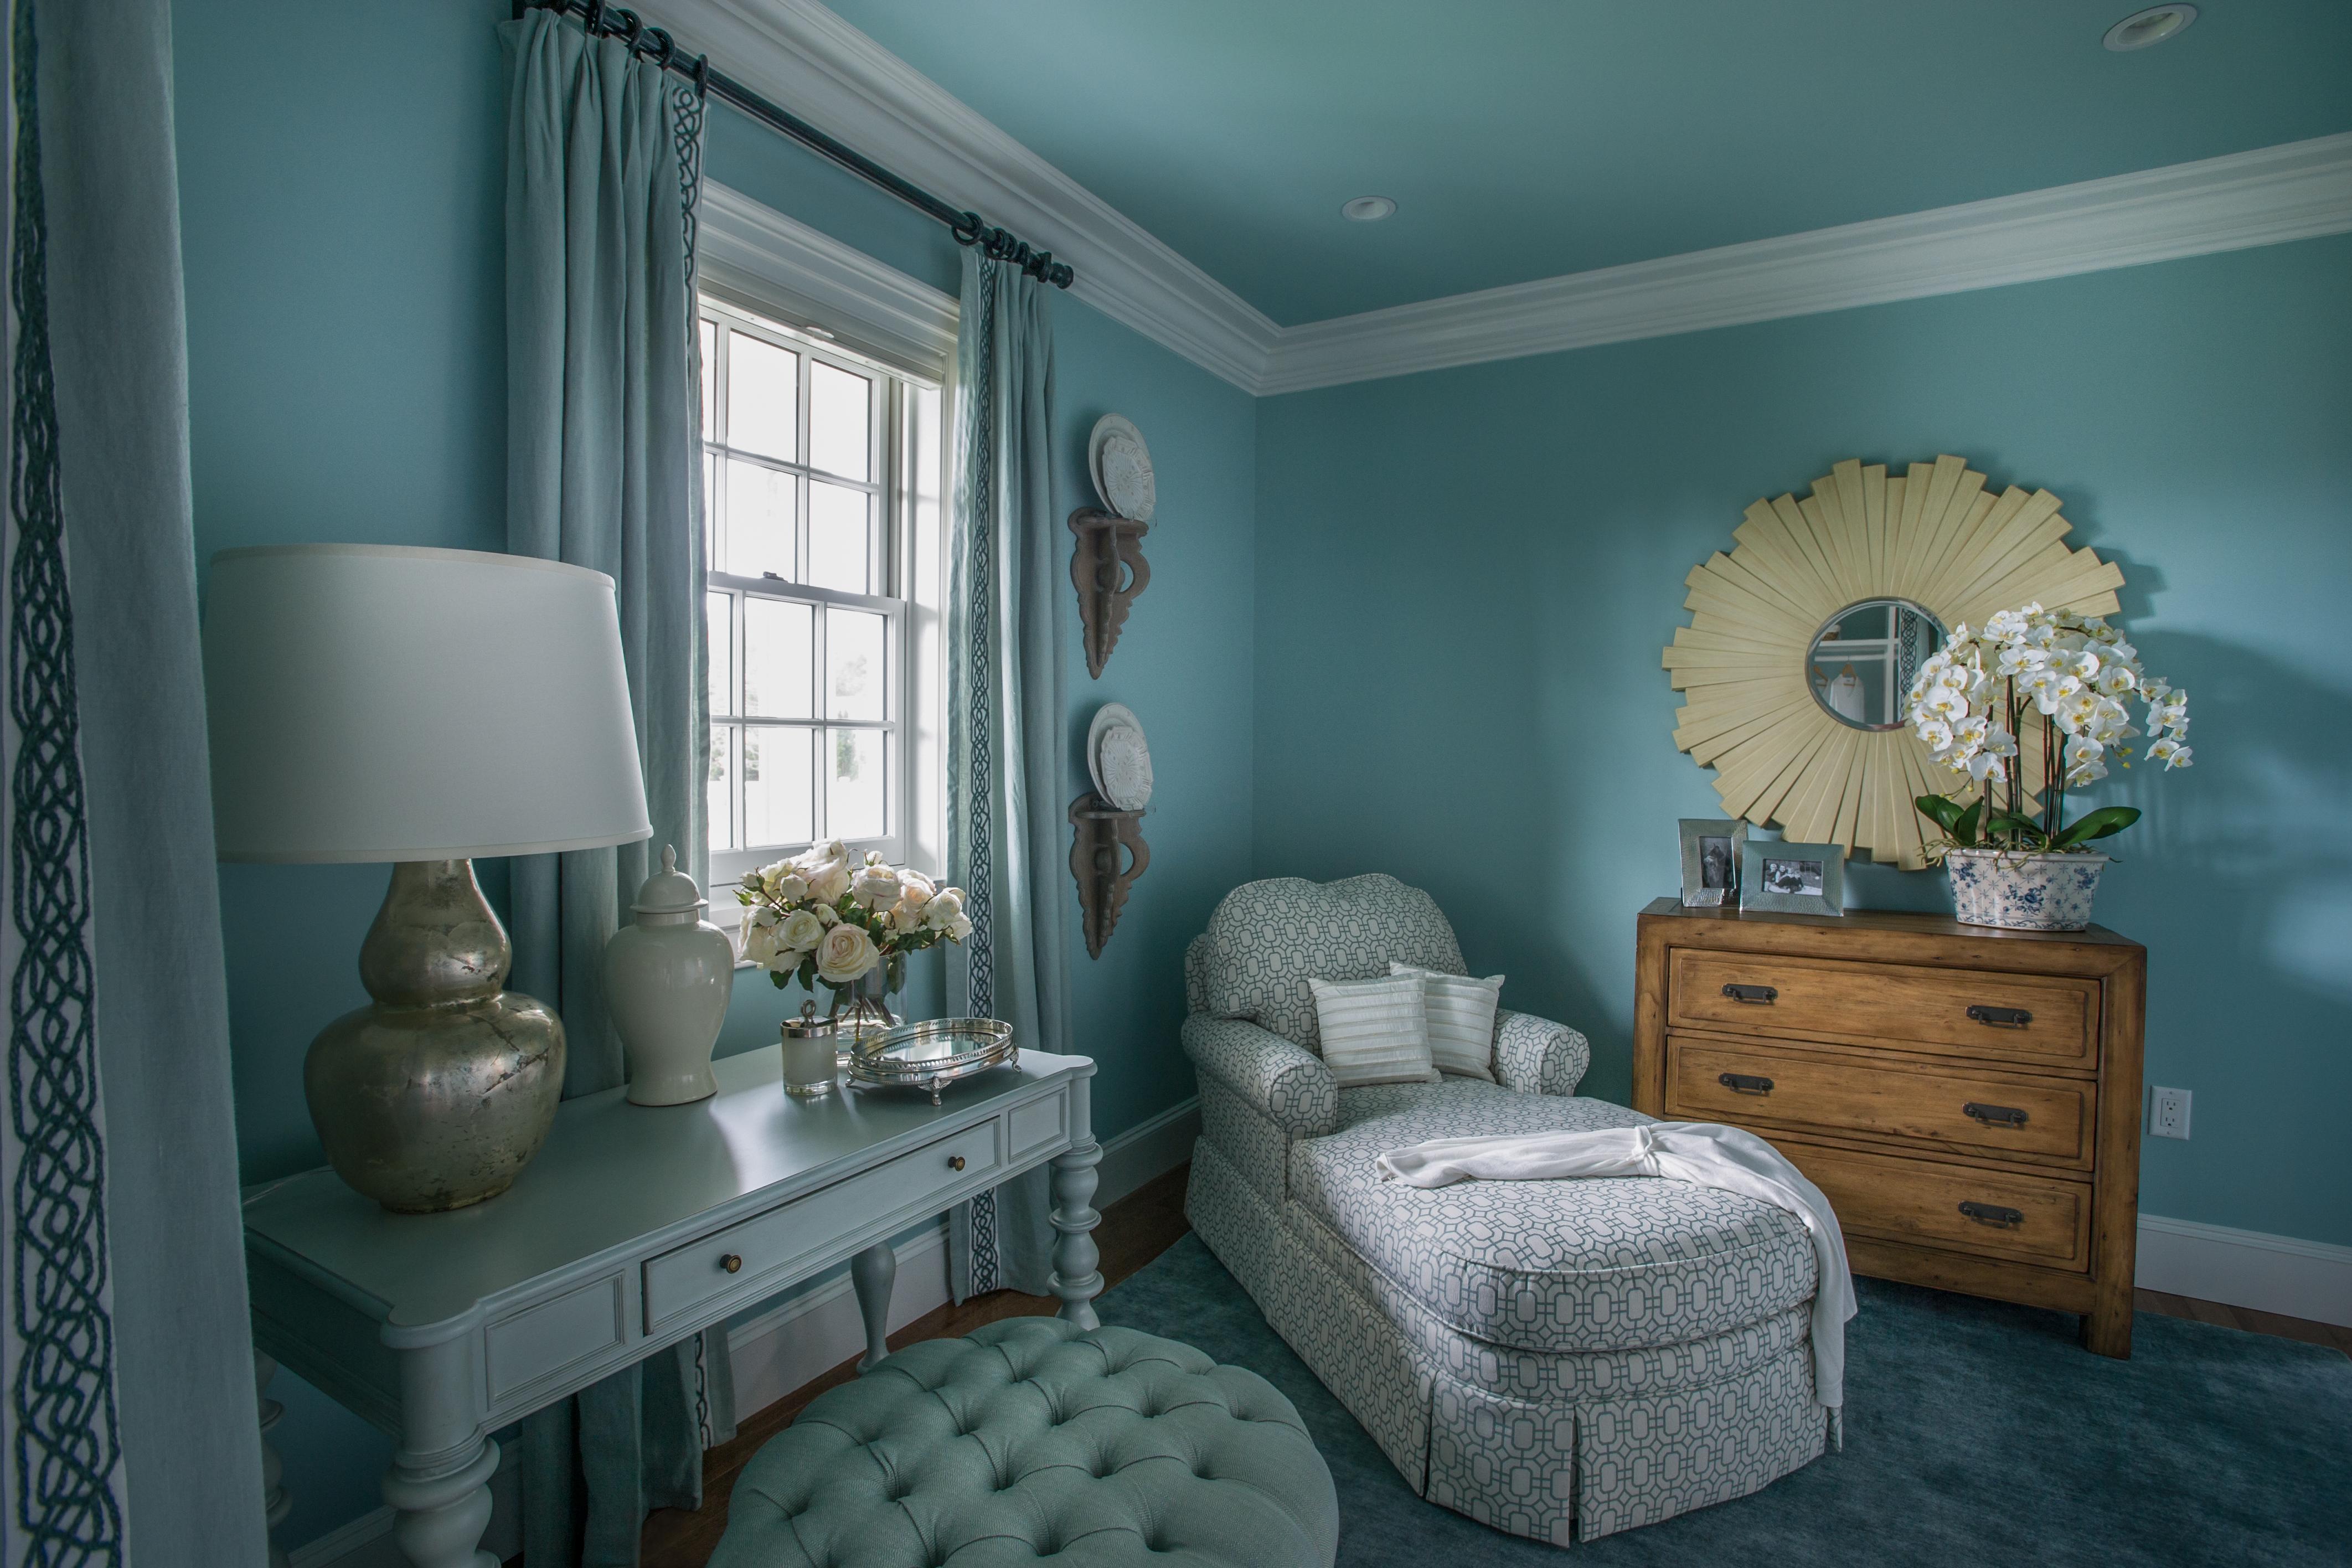 Stylish Bedroom Design Trends for 2015 on Trendy Bedroom Ideas  id=64557